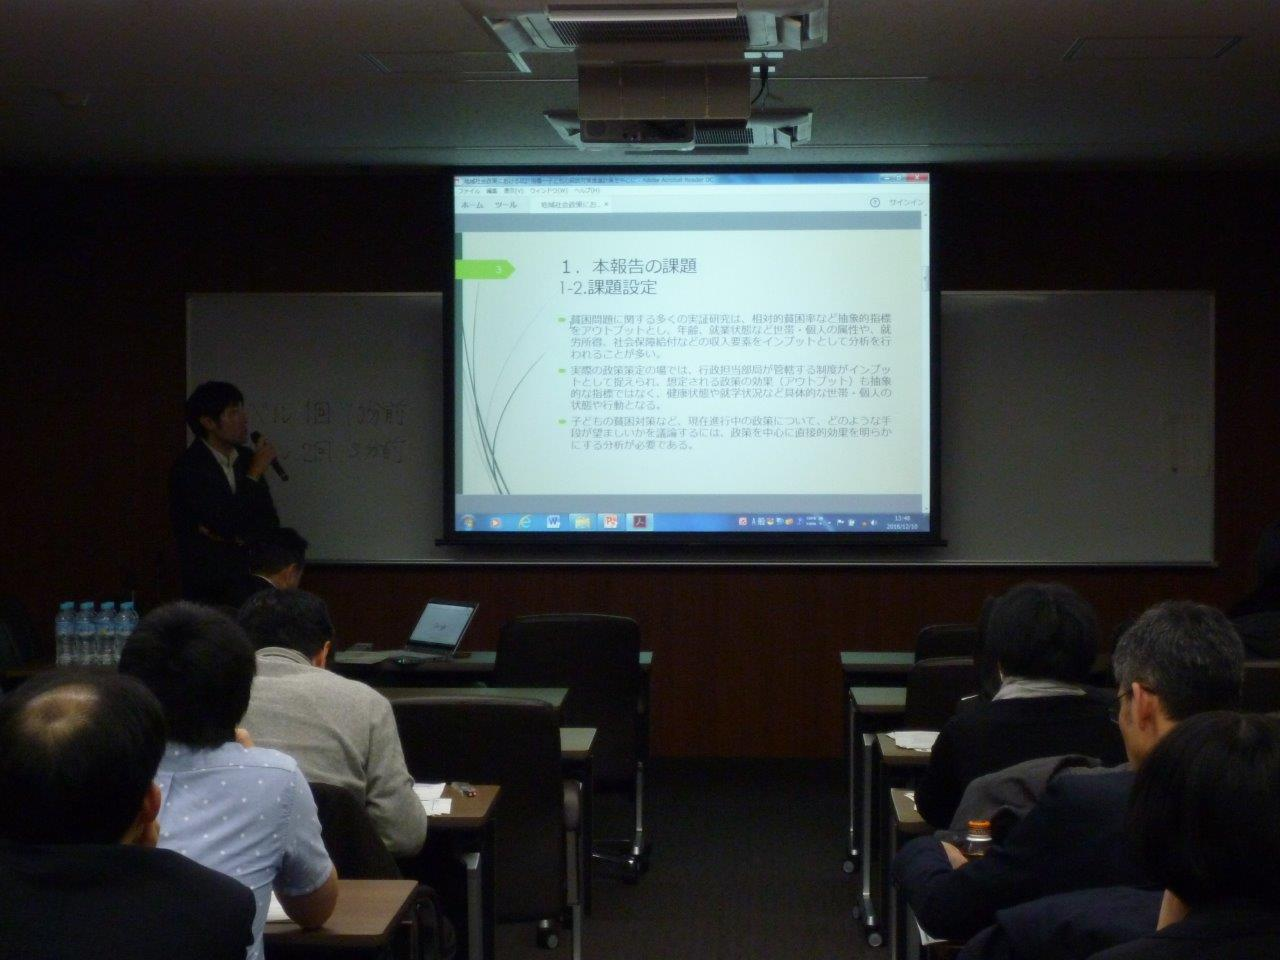 http://rcisss.ier.hit-u.ac.jp/Japanese/micro/information/P1040194.jpg